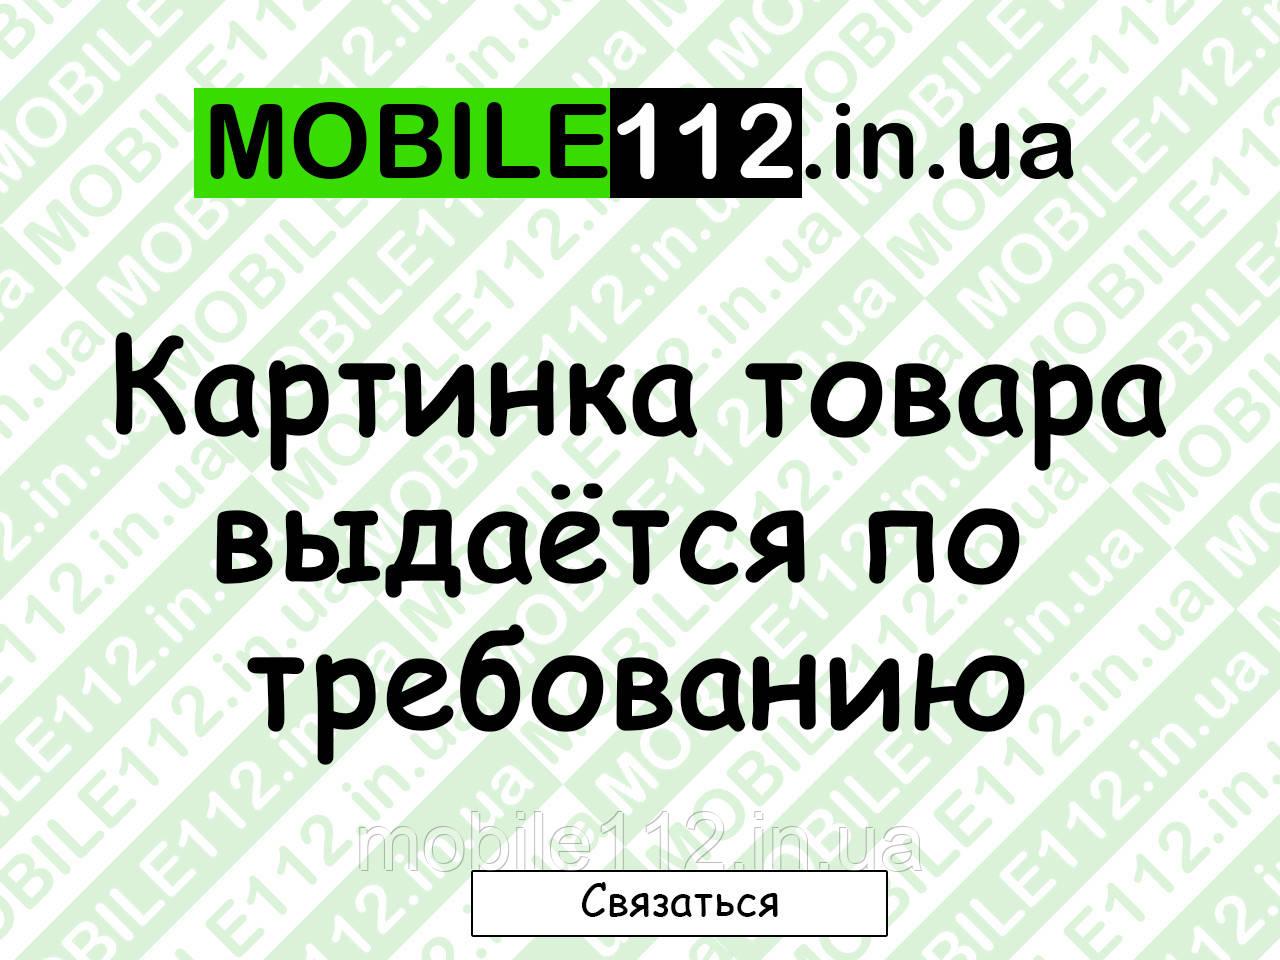 Дисплей для Samsung i9150 Galaxy Mega 5.8/ i9152, оригинал (Китай)